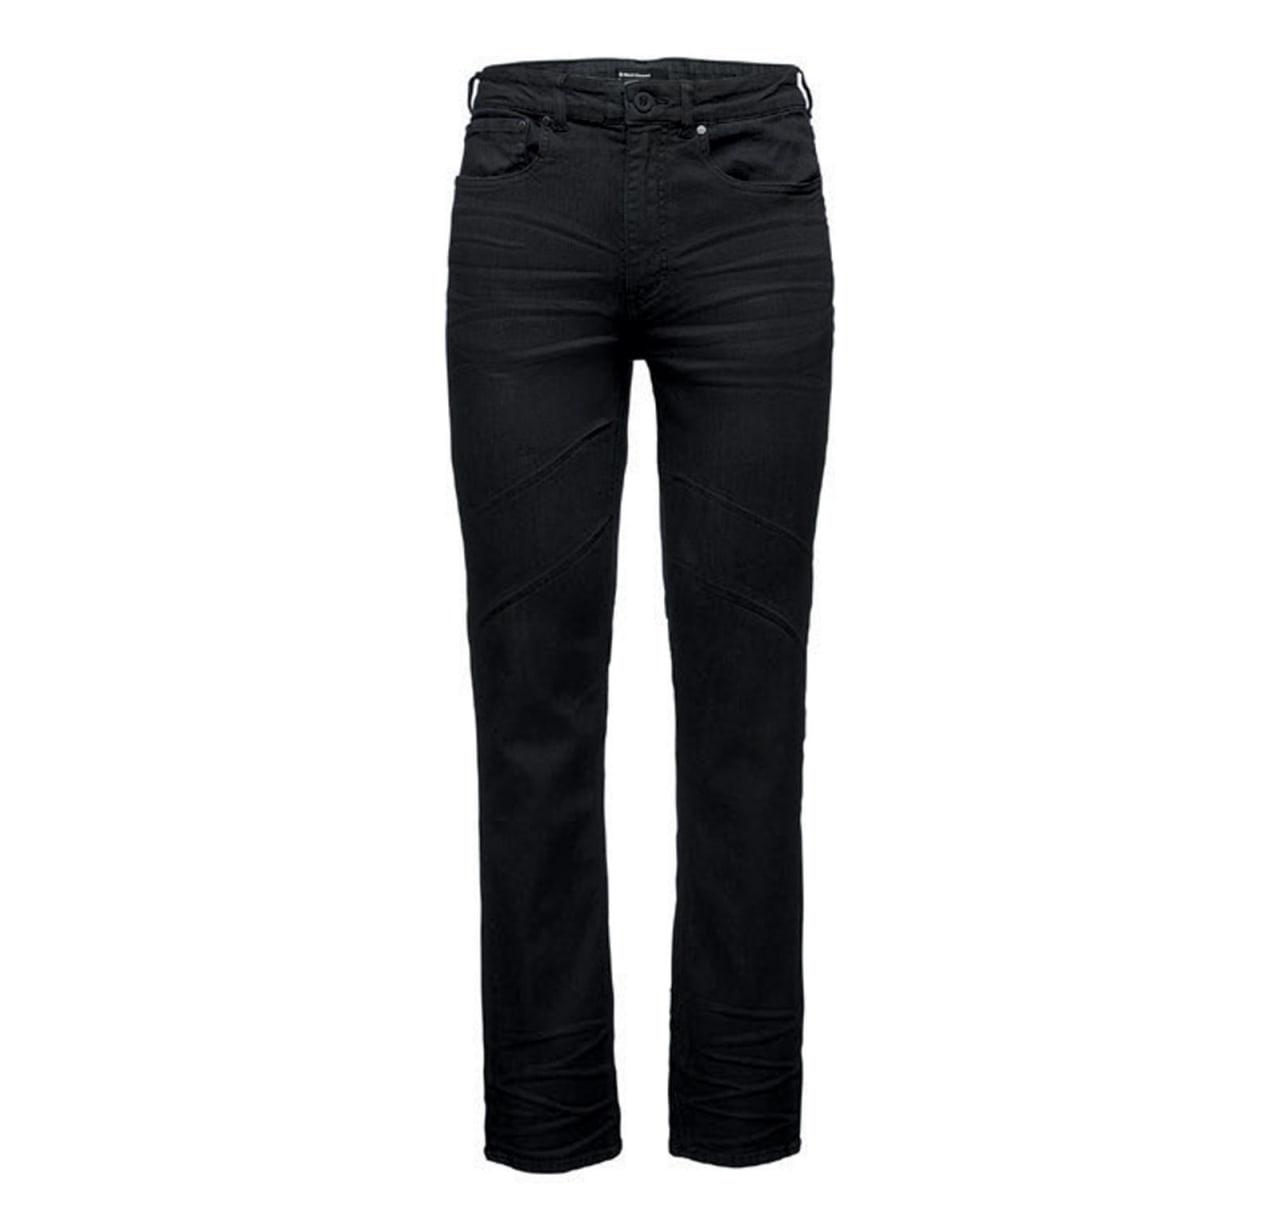 Black Diamond Forged Denim pants